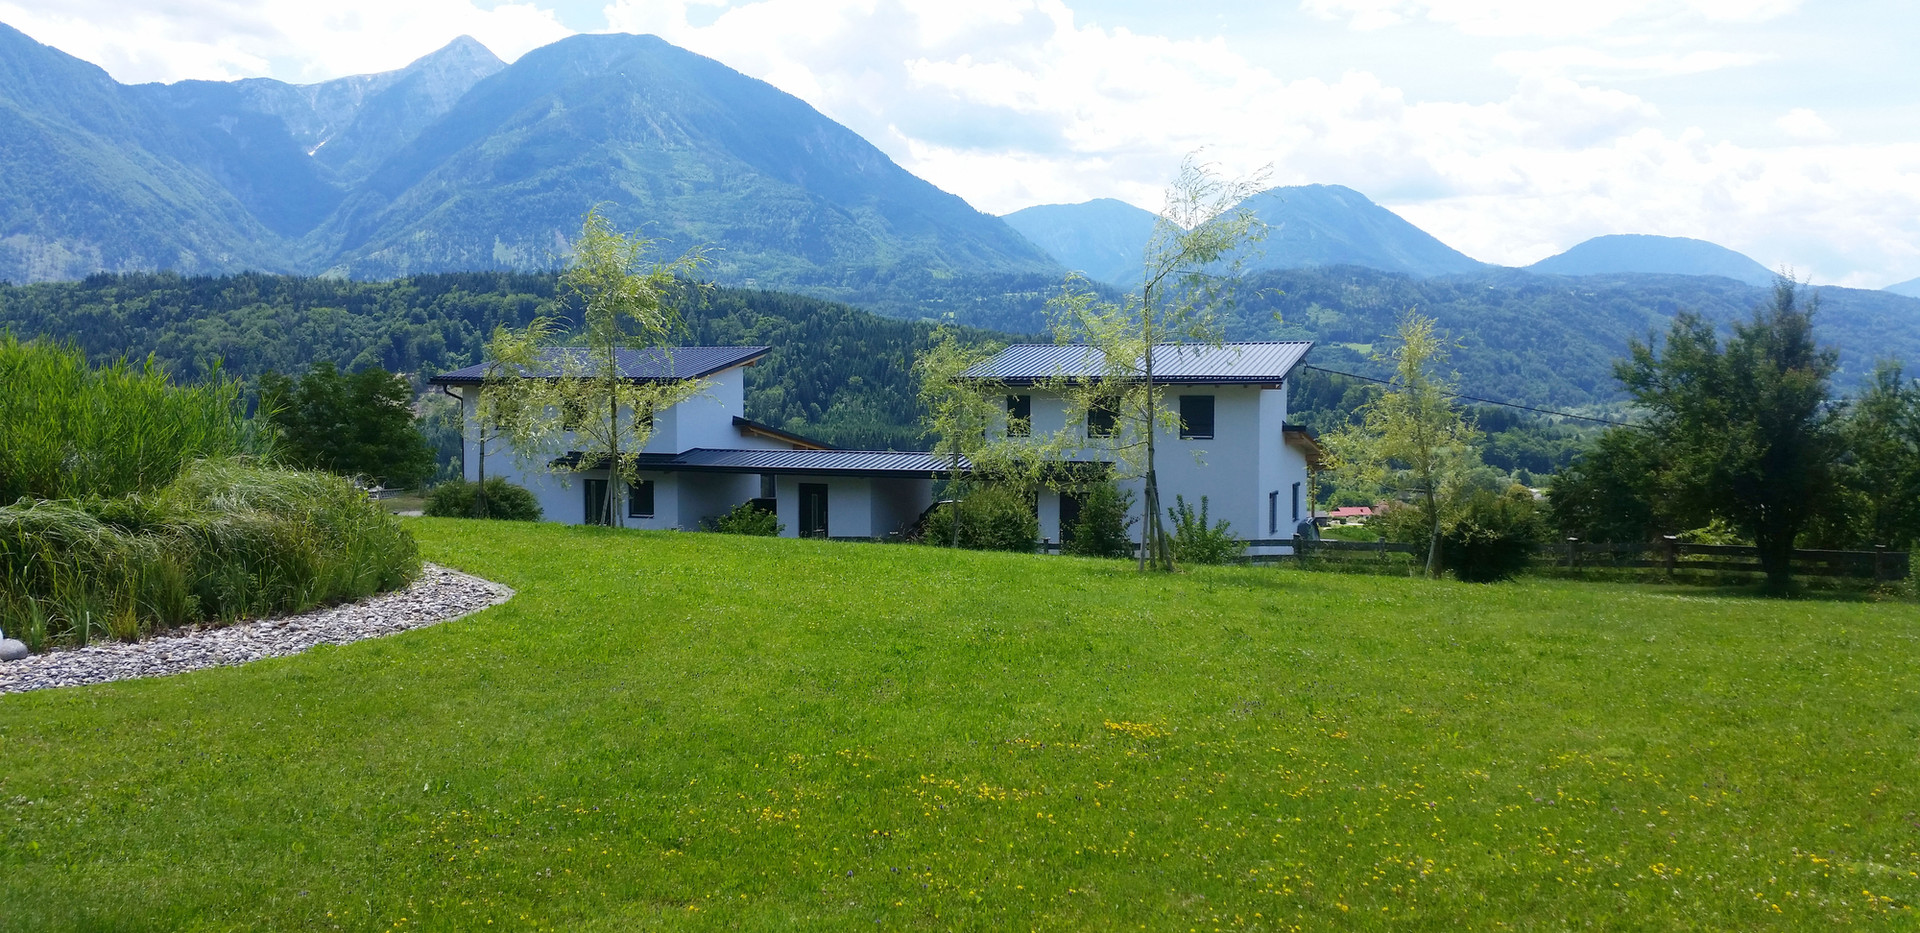 Häuser Ausblick Berge